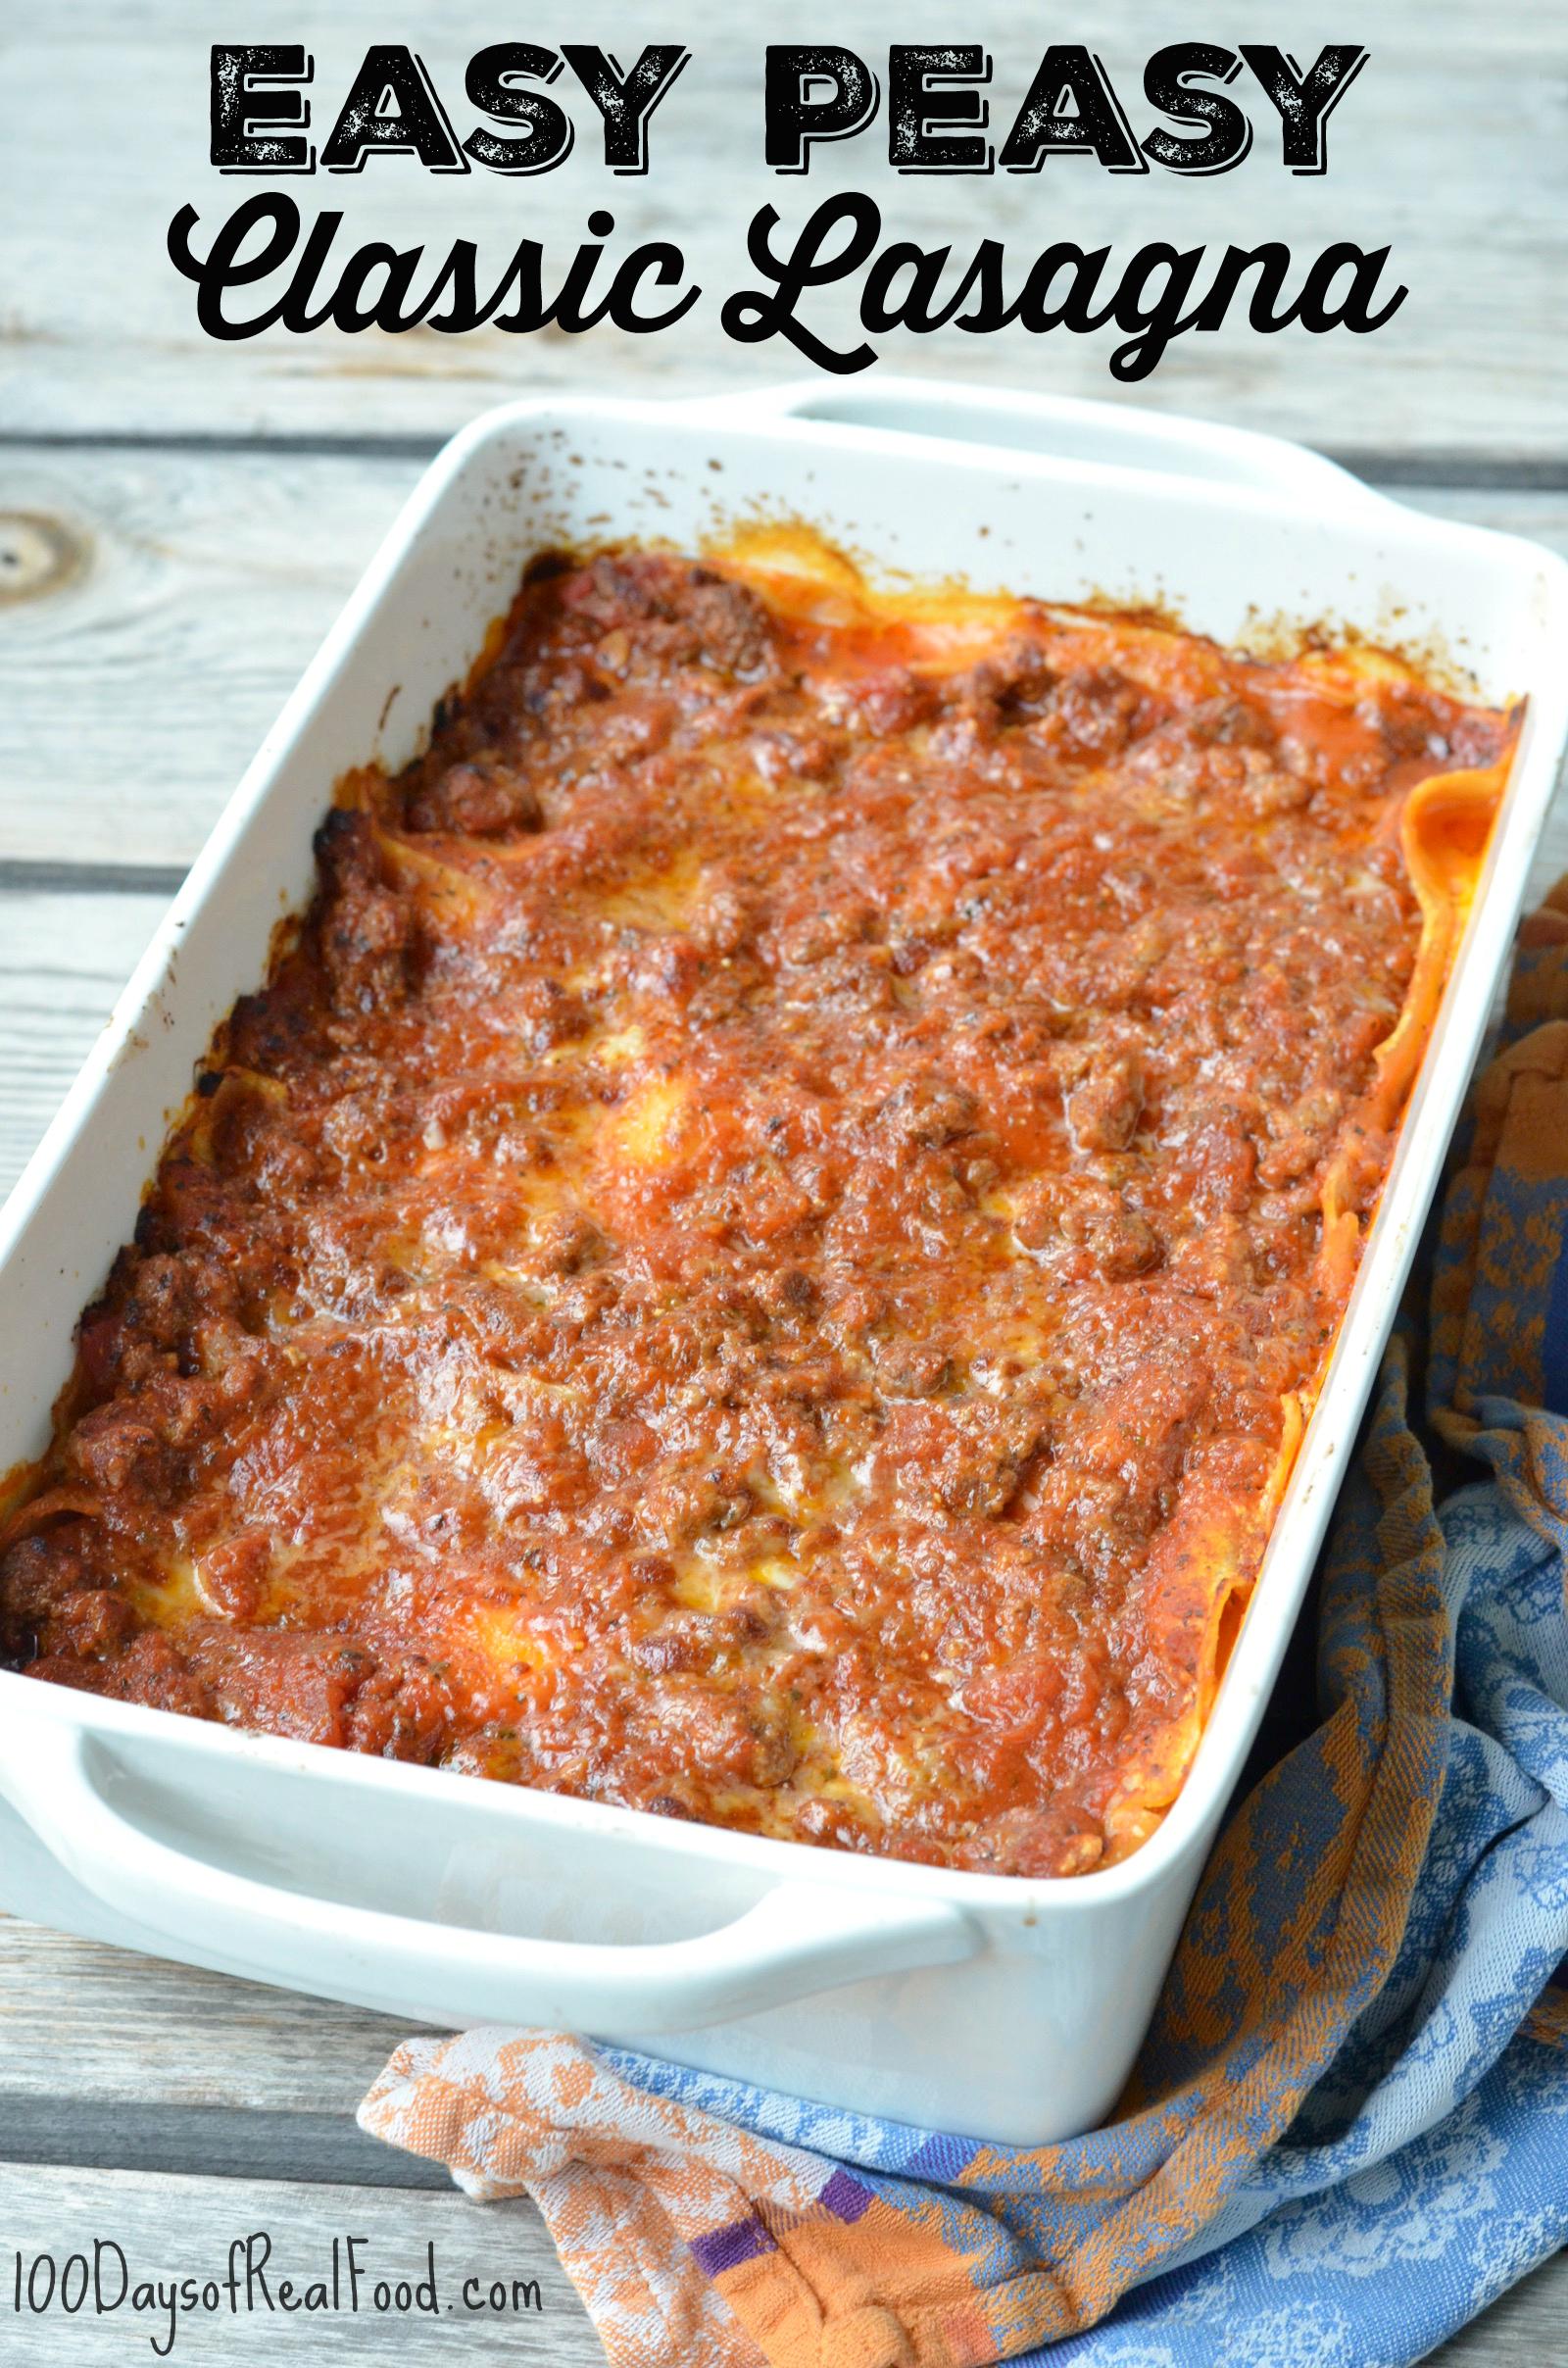 Classic Lasagna in white rectangular bakign dish